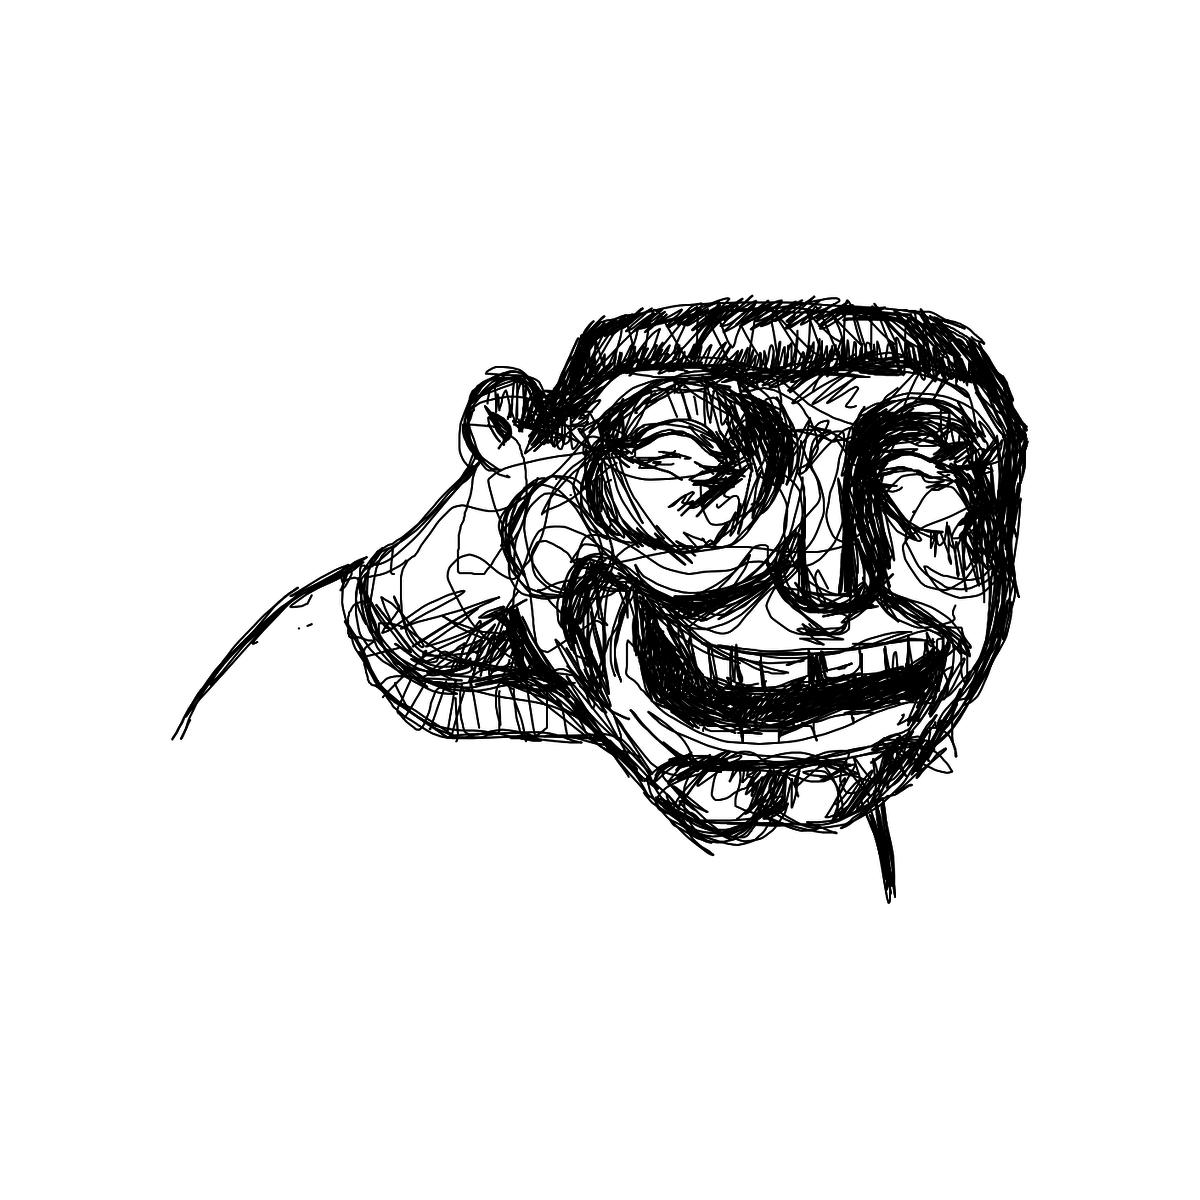 BAAAM drawing#18067 lat:48.1873855590820300lng: 16.3491687774658200